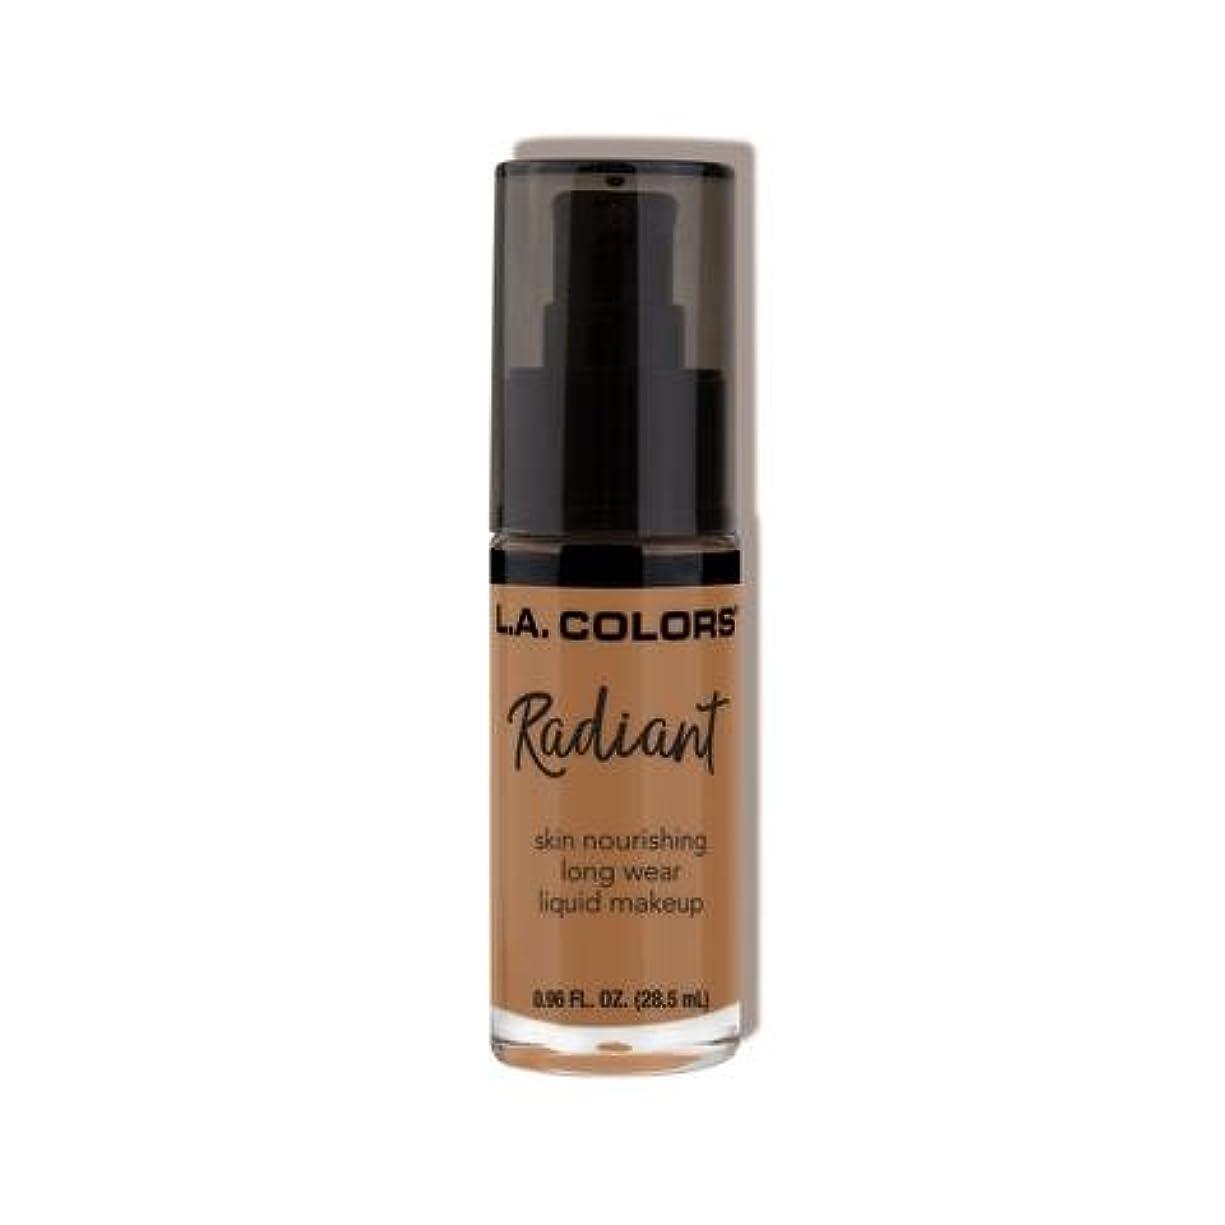 (3 Pack) L.A. COLORS Radiant Liquid Makeup - Chestnut (並行輸入品)